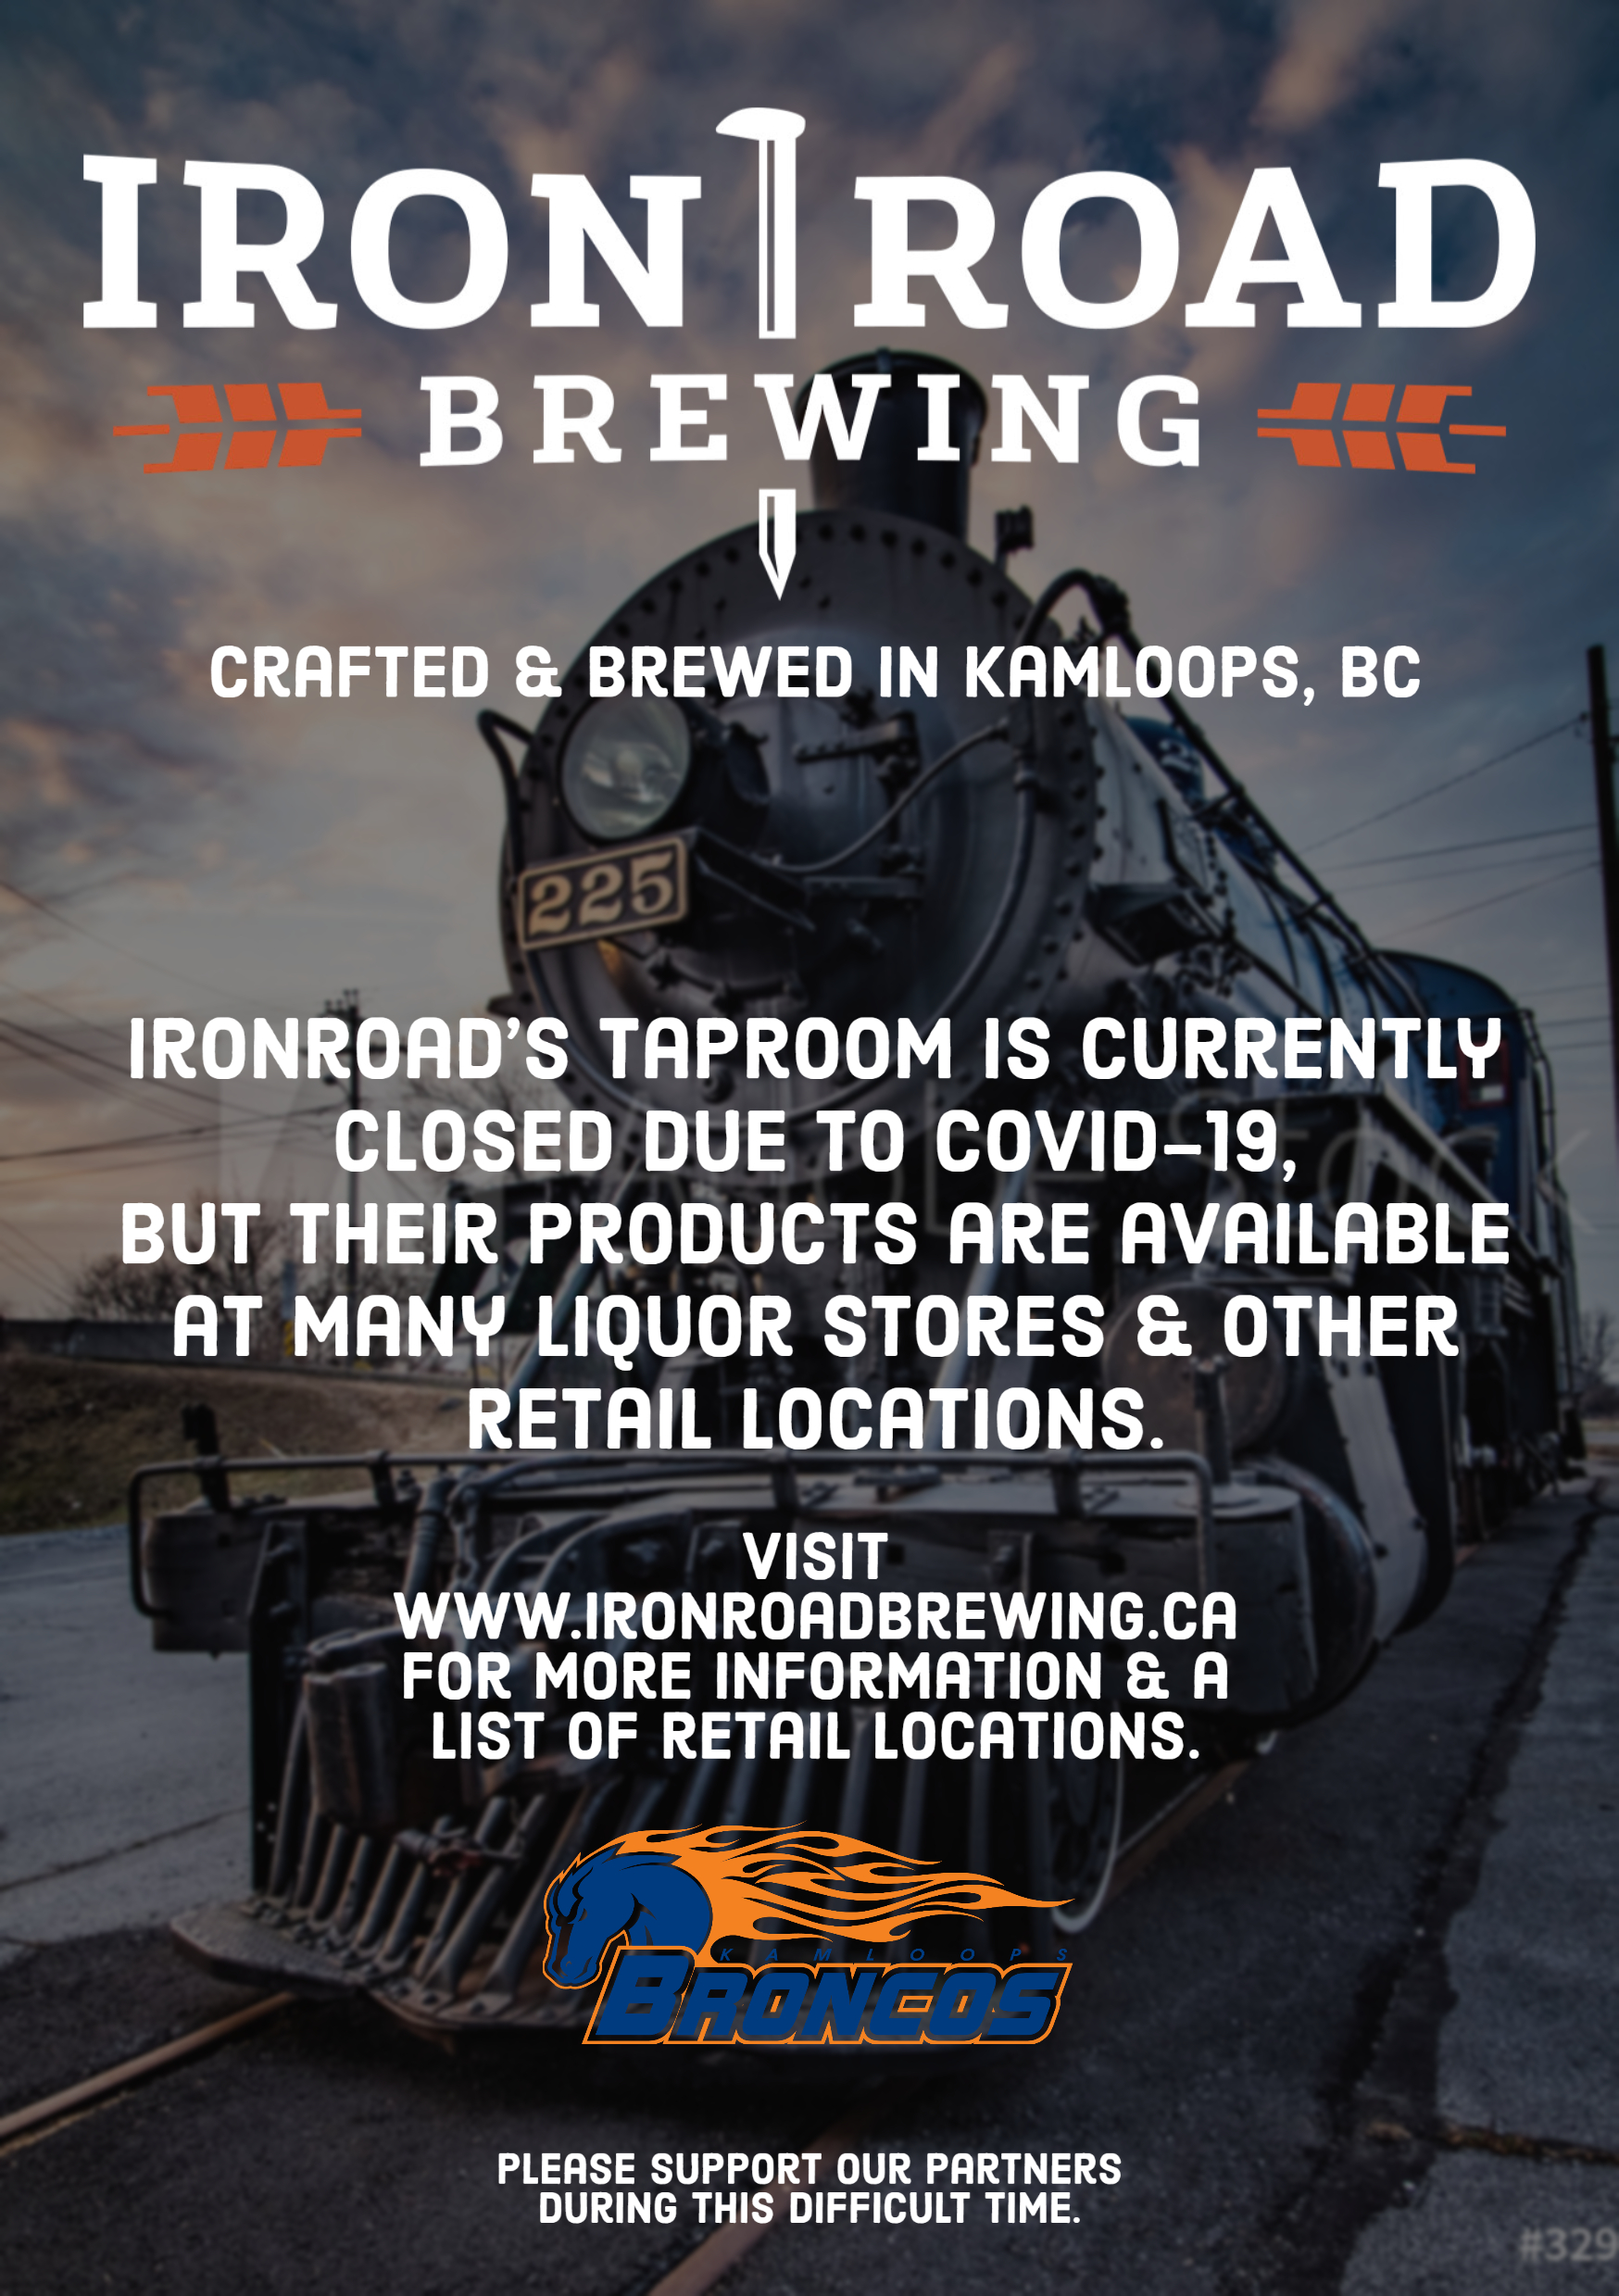 ironroad micro brewery ad